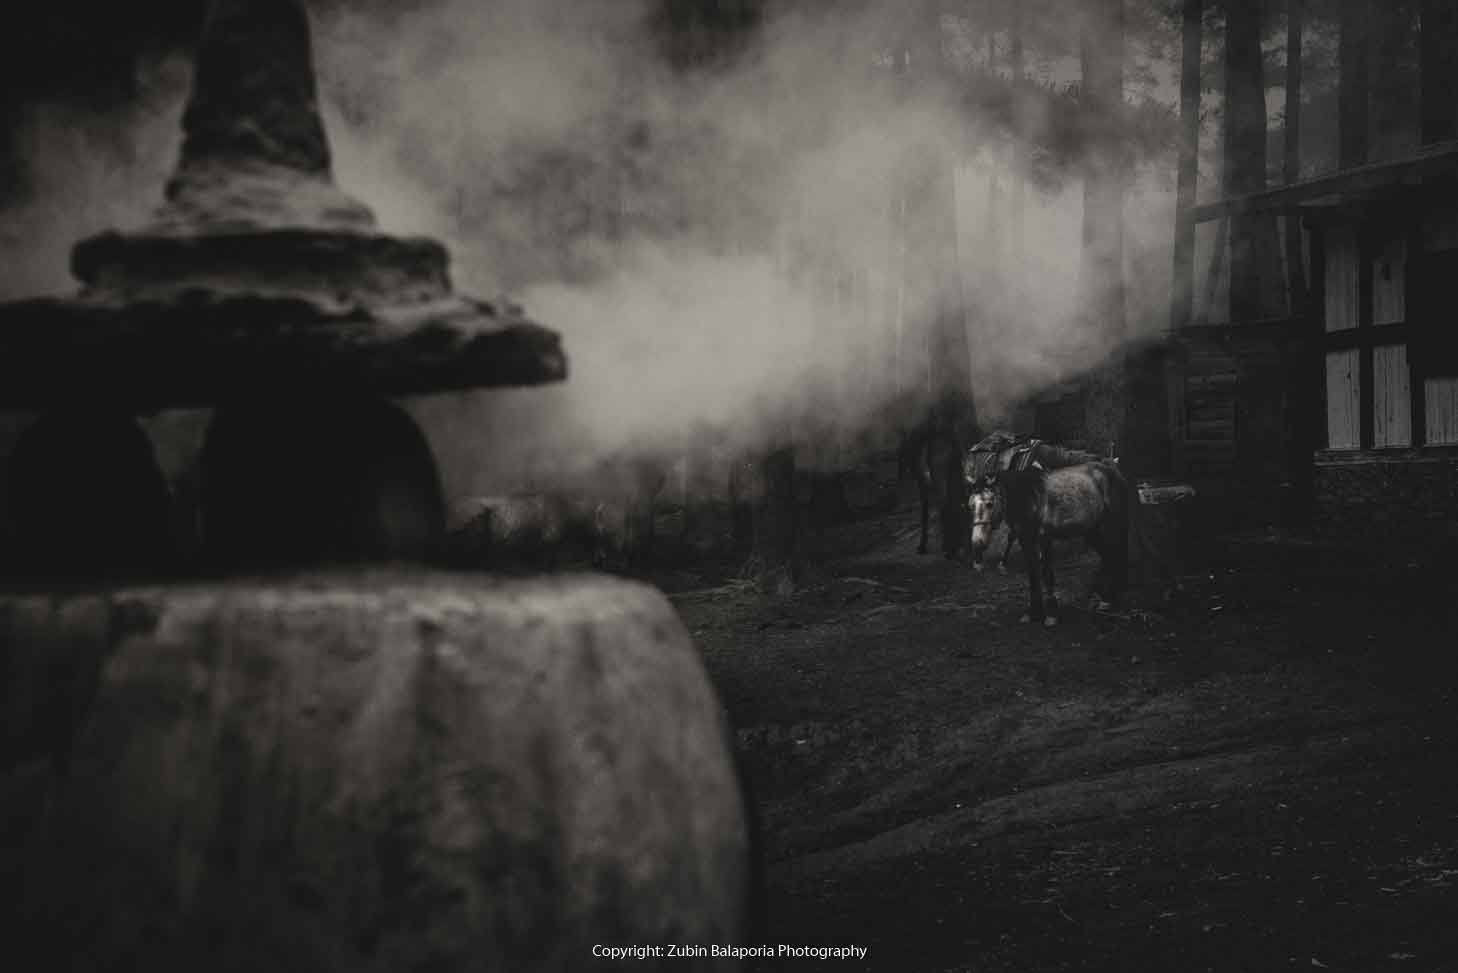 Chorten Smoke and Horse